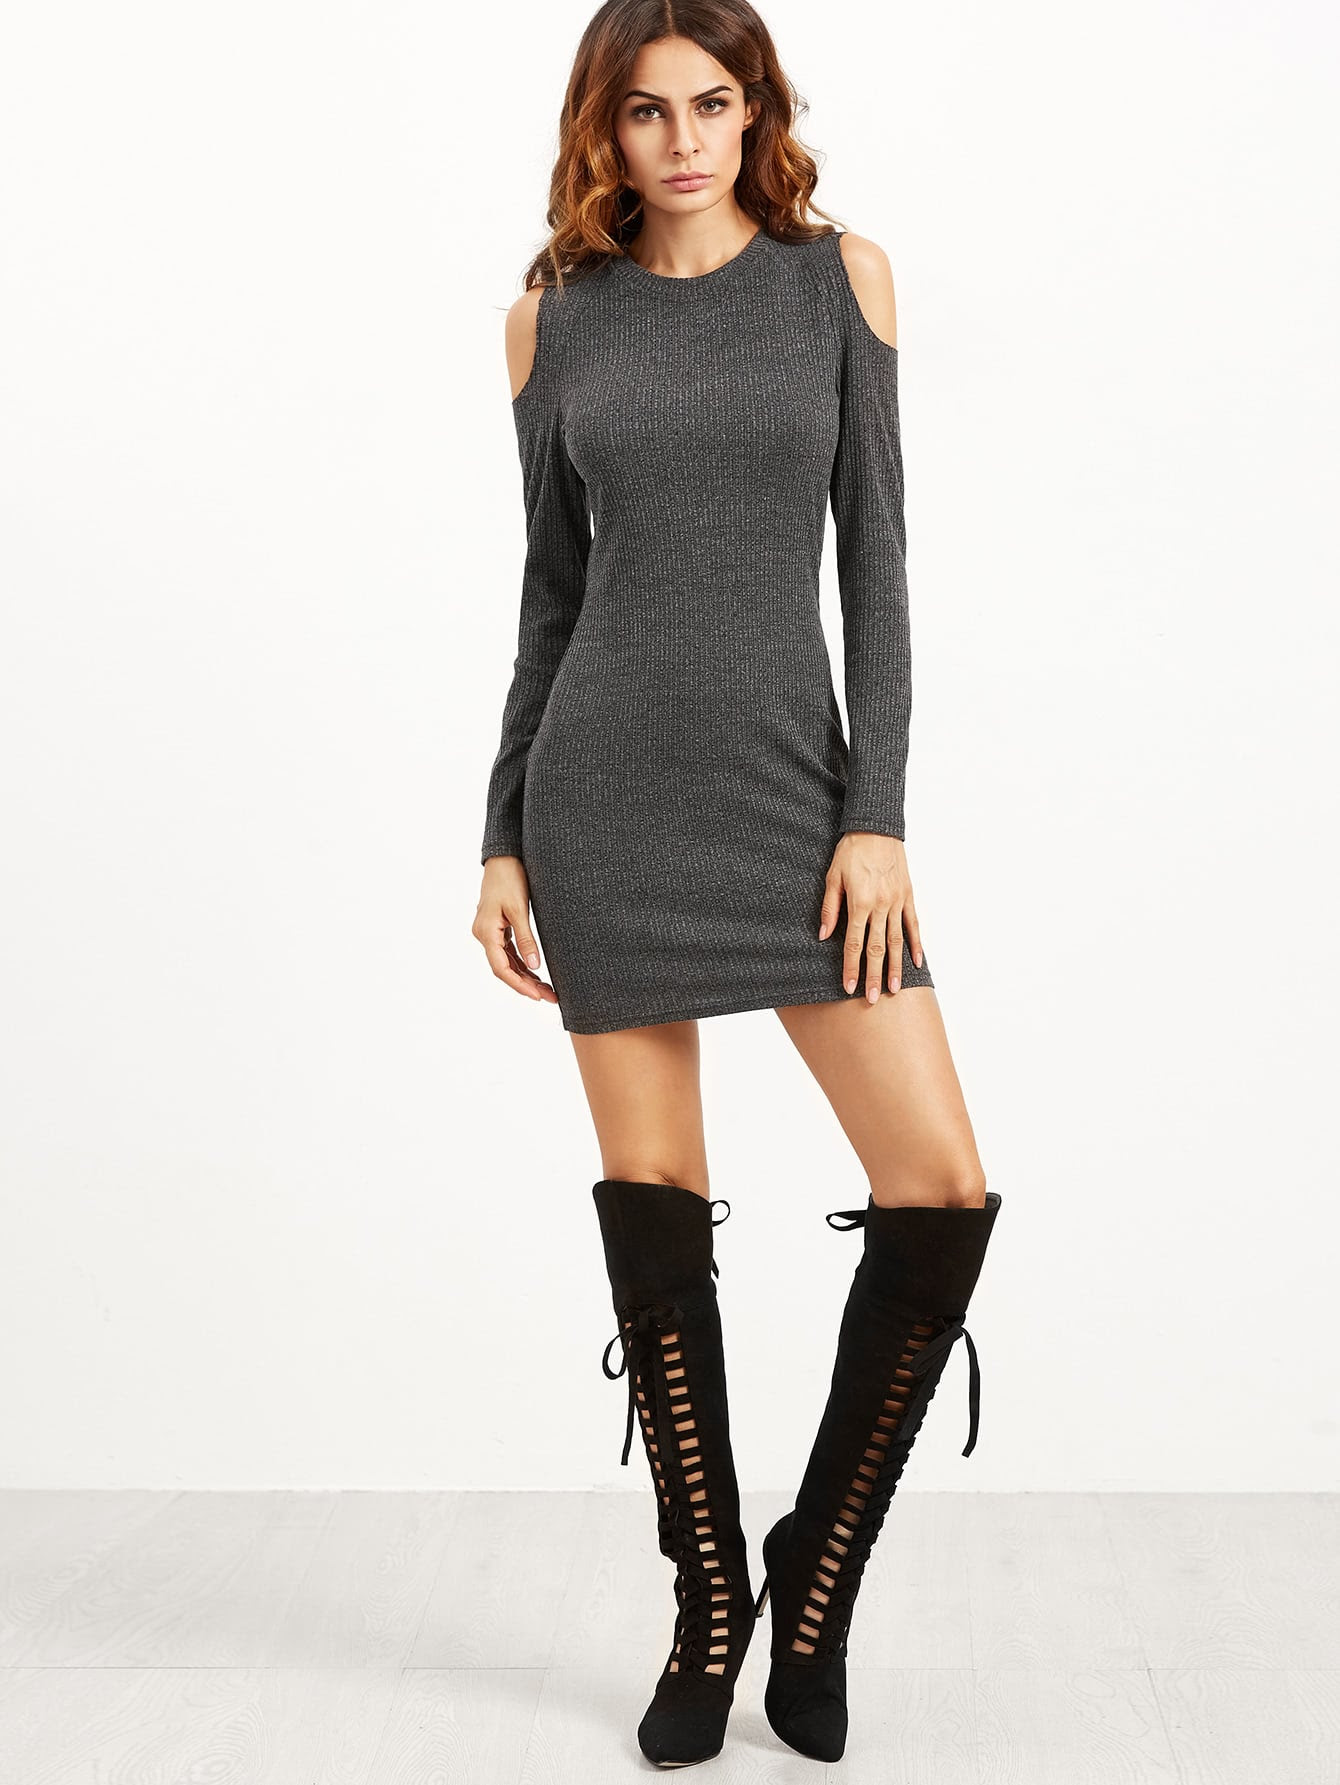 Zappos natural fabrics black lace ladder detail frill hem bodycon dress knit tops new